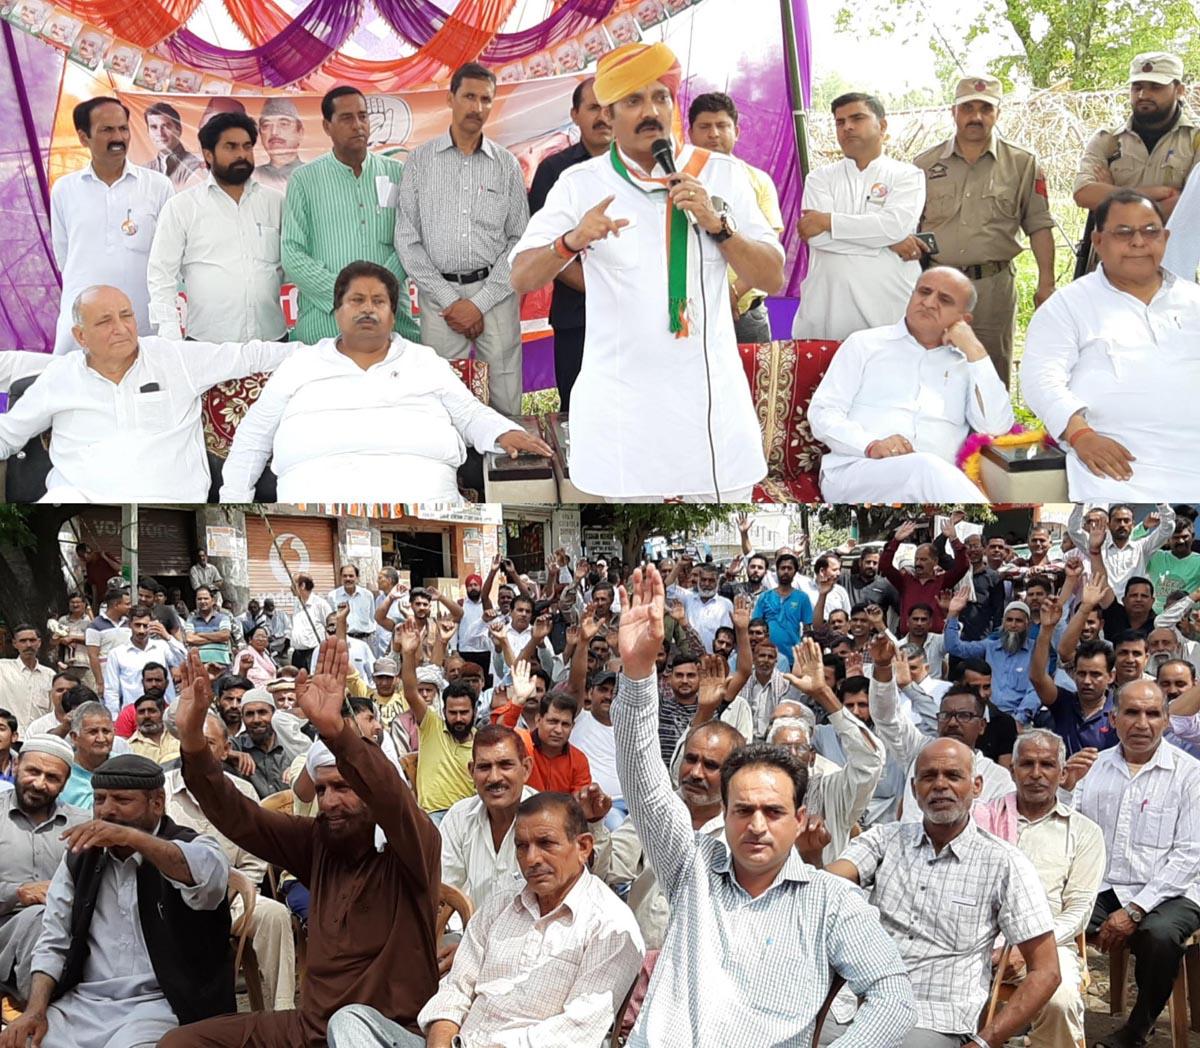 Congress candidate Vikramaditya Singh addressing an election rally in Hiranagar.